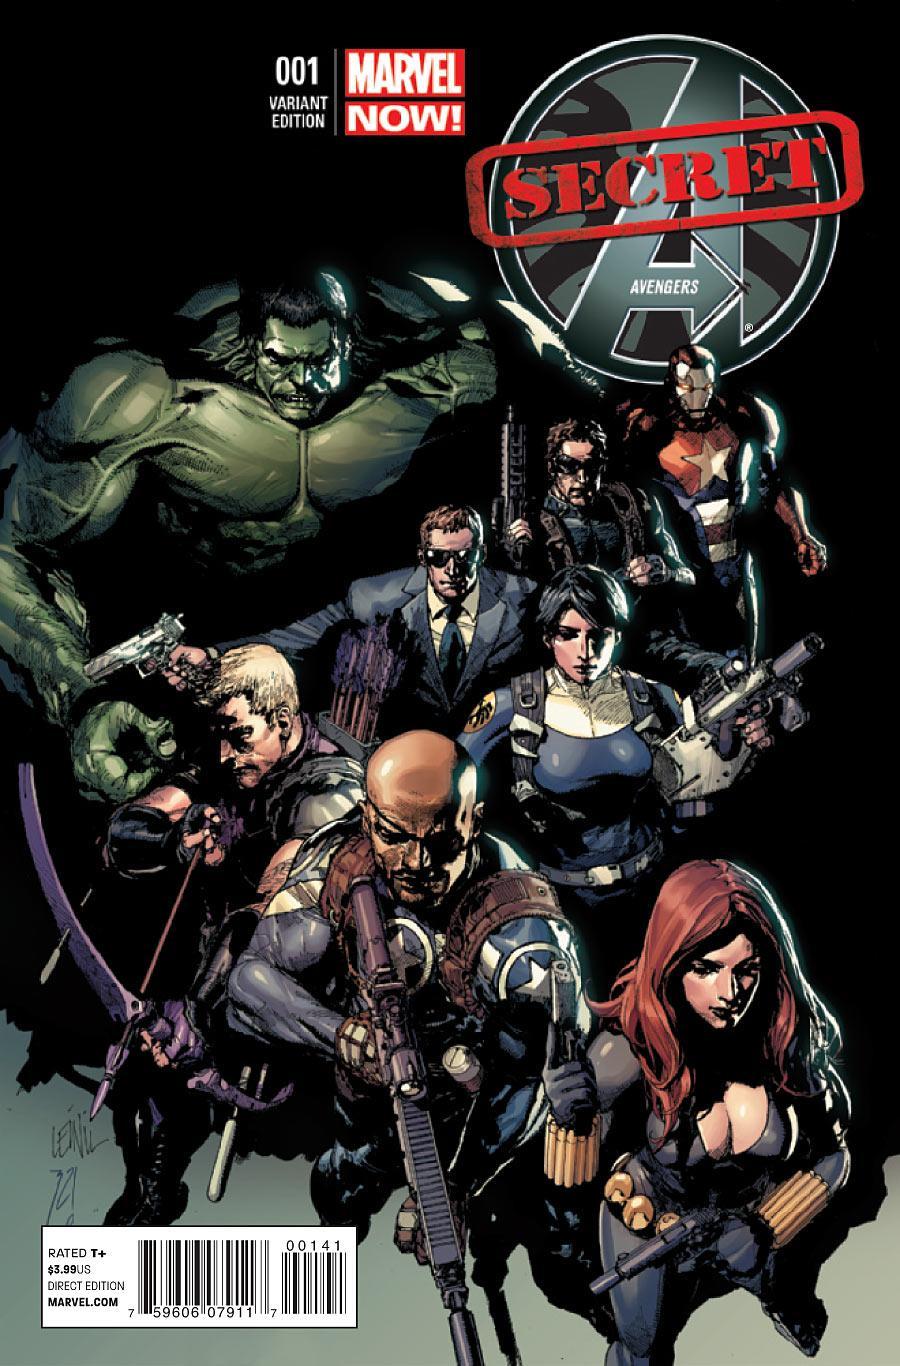 http://img2.wikia.nocookie.net/__cb20130207235020/marveldatabase/images/7/77/Secret_Avengers_Vol_2_1_Yu_Variant.jpg